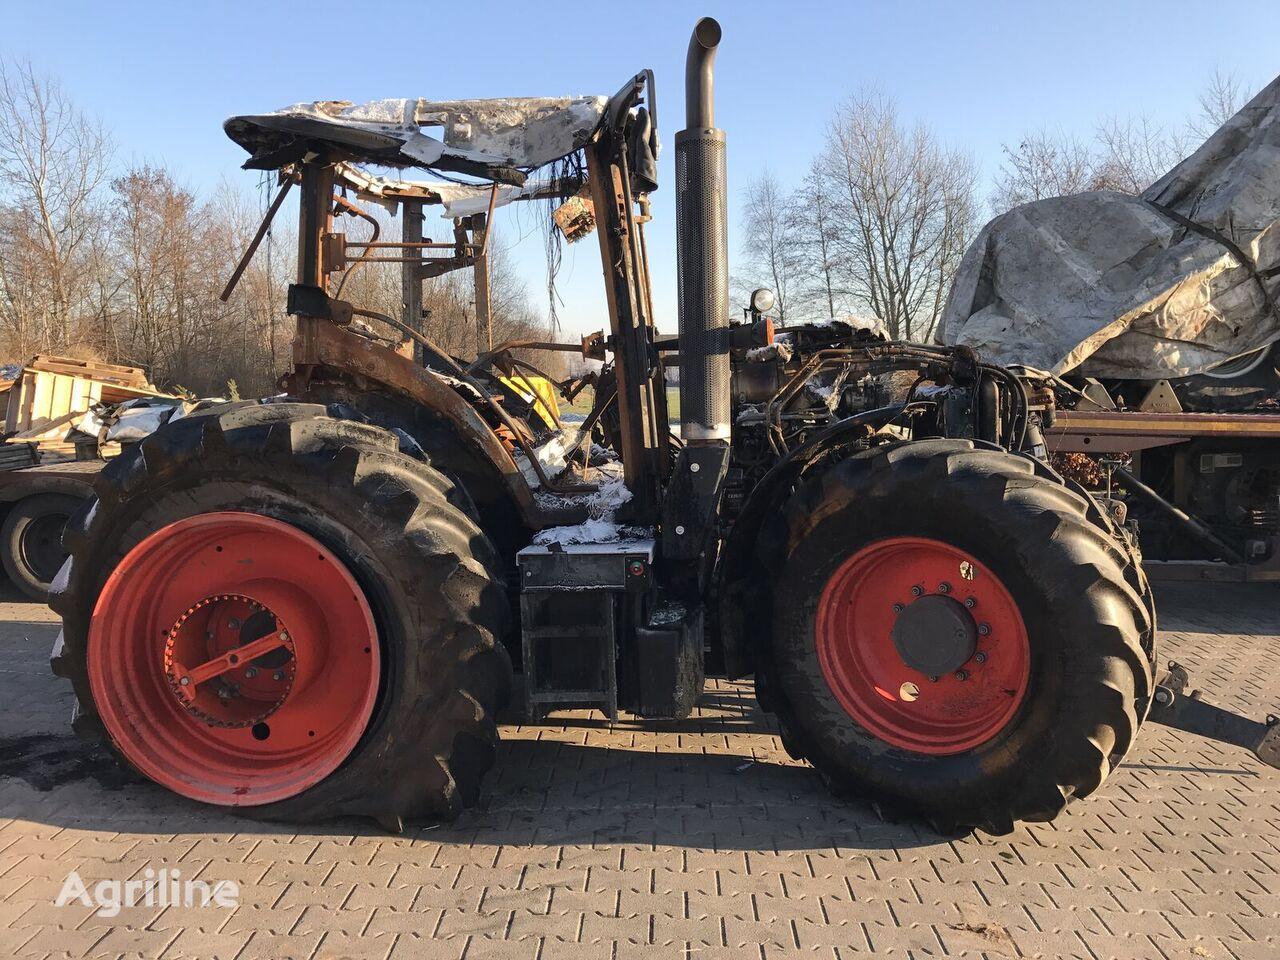 damaged CLAAS Arion 550 Merlo John Deere wheel tractor